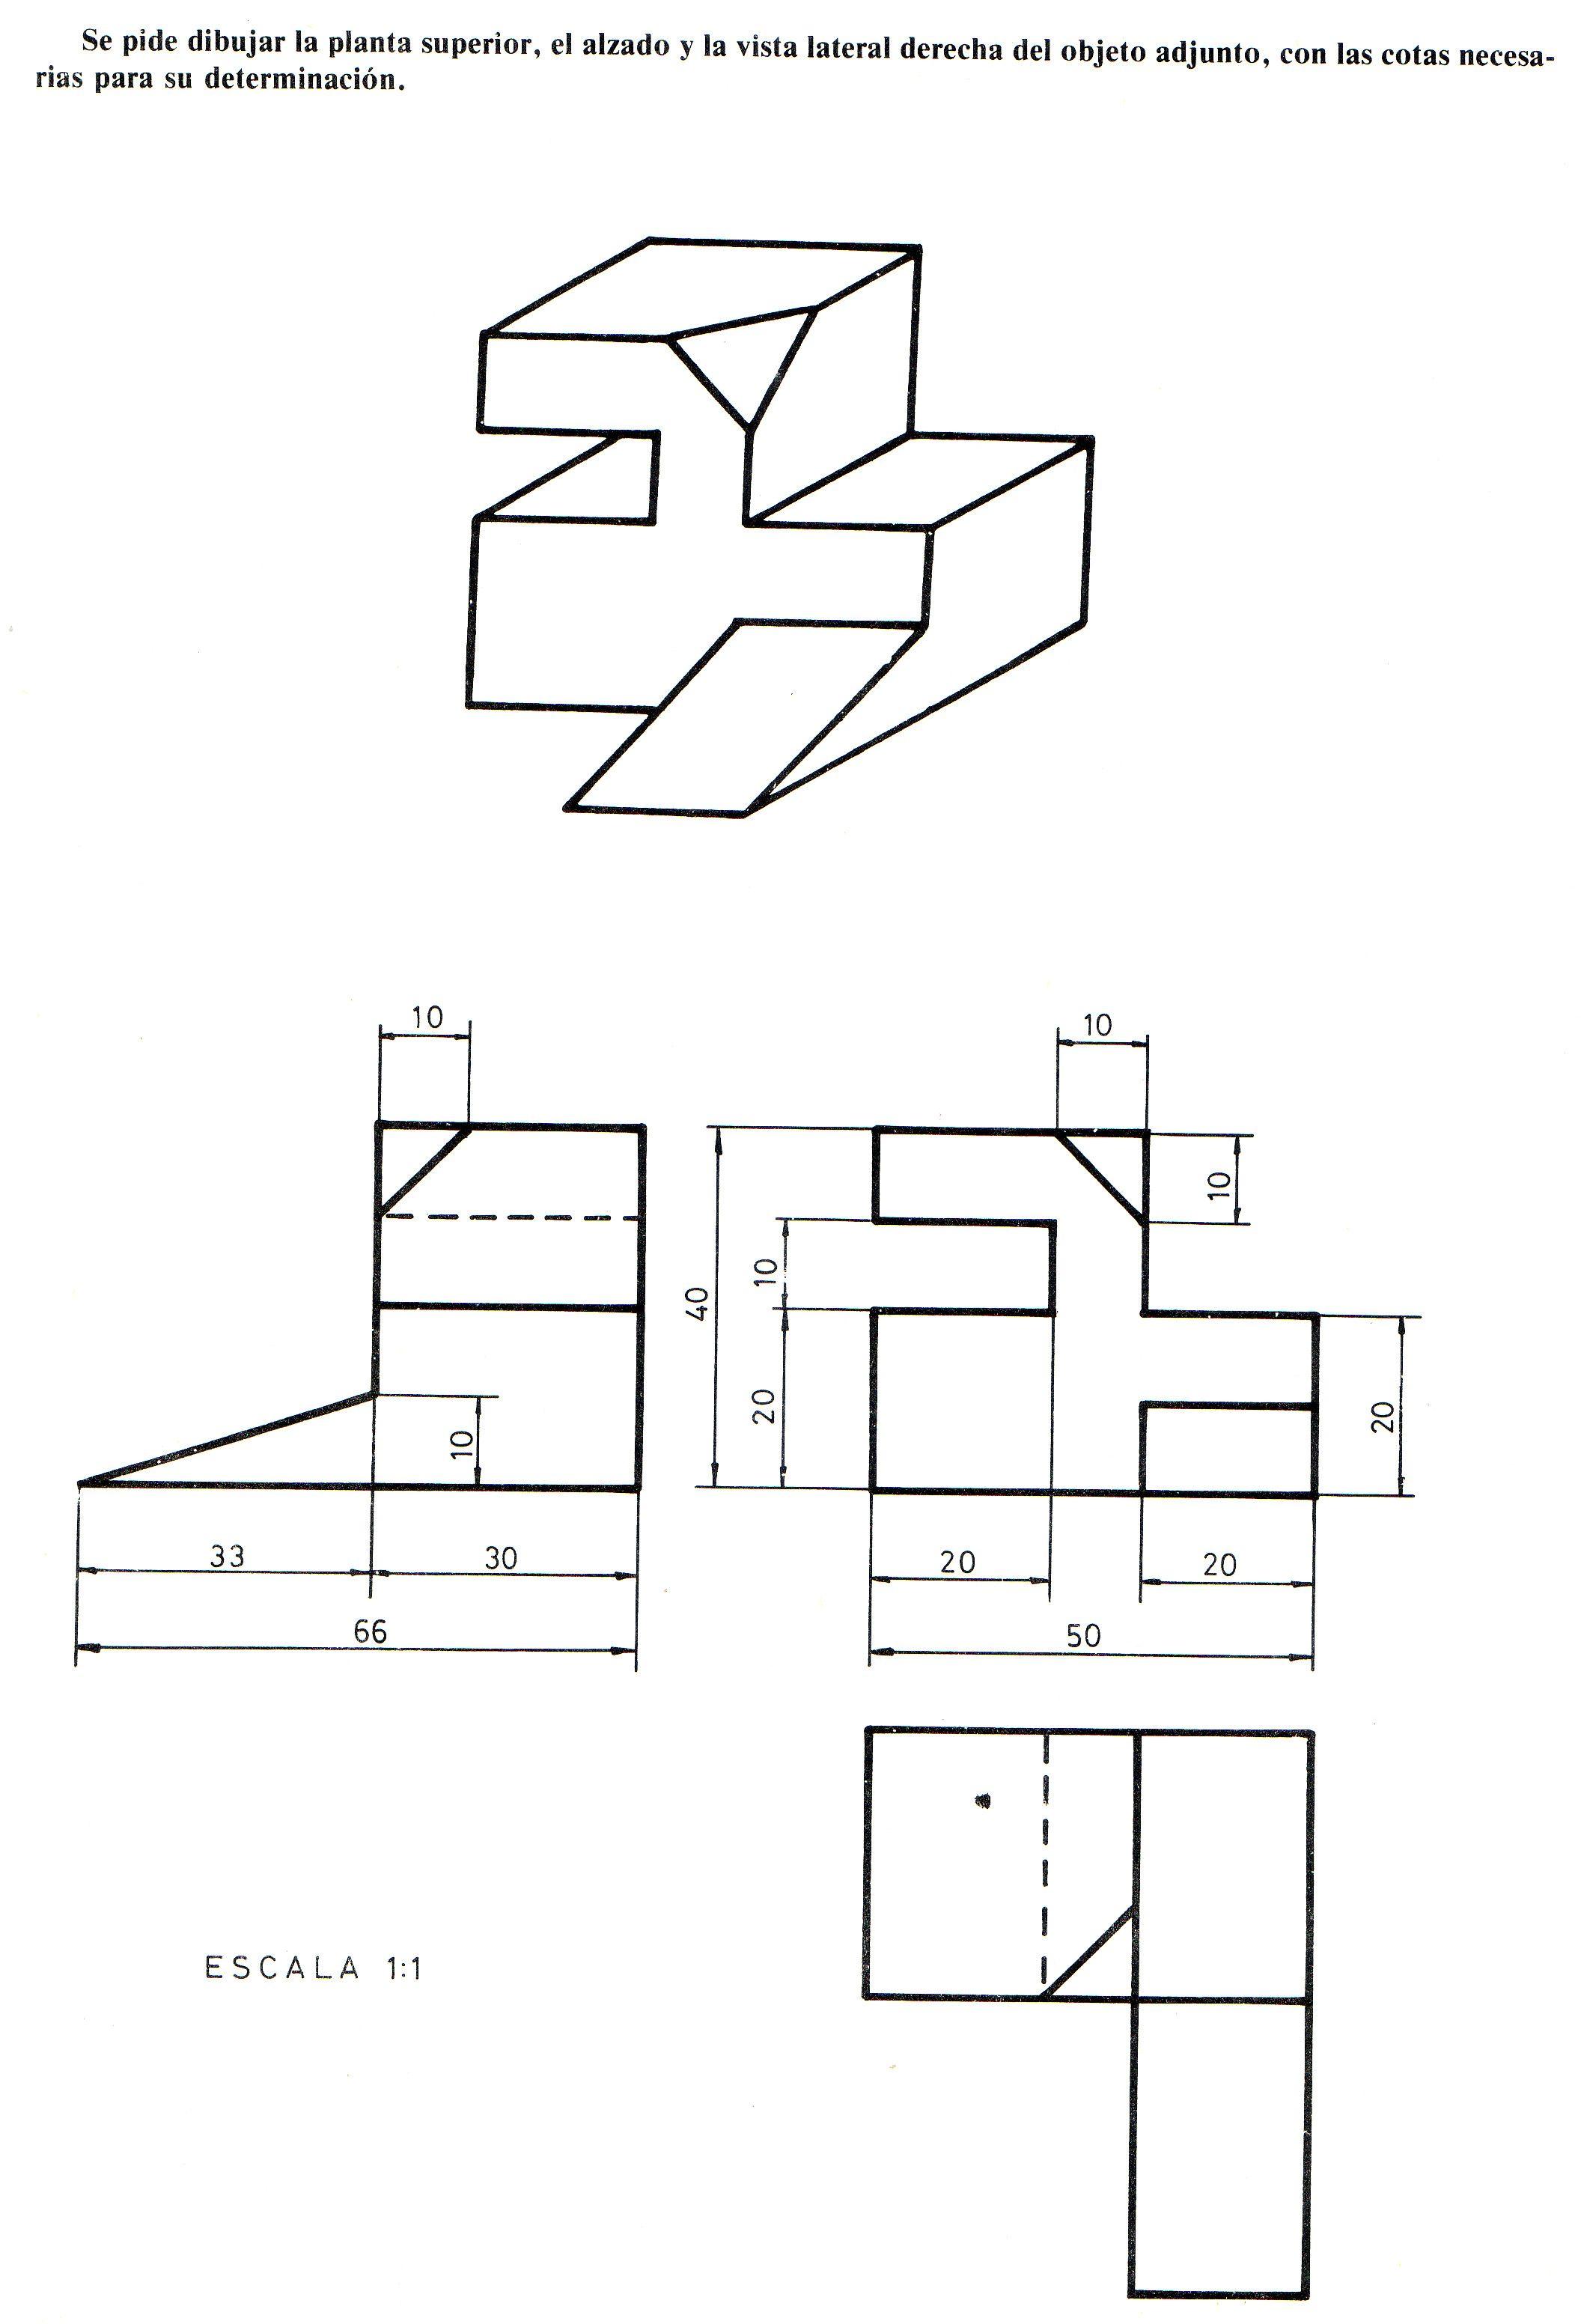 Pin De Raquel De Pablo En Dt Tecnicas De Dibujo Vistas Dibujo Tecnico Libro De Dibujo Tecnico